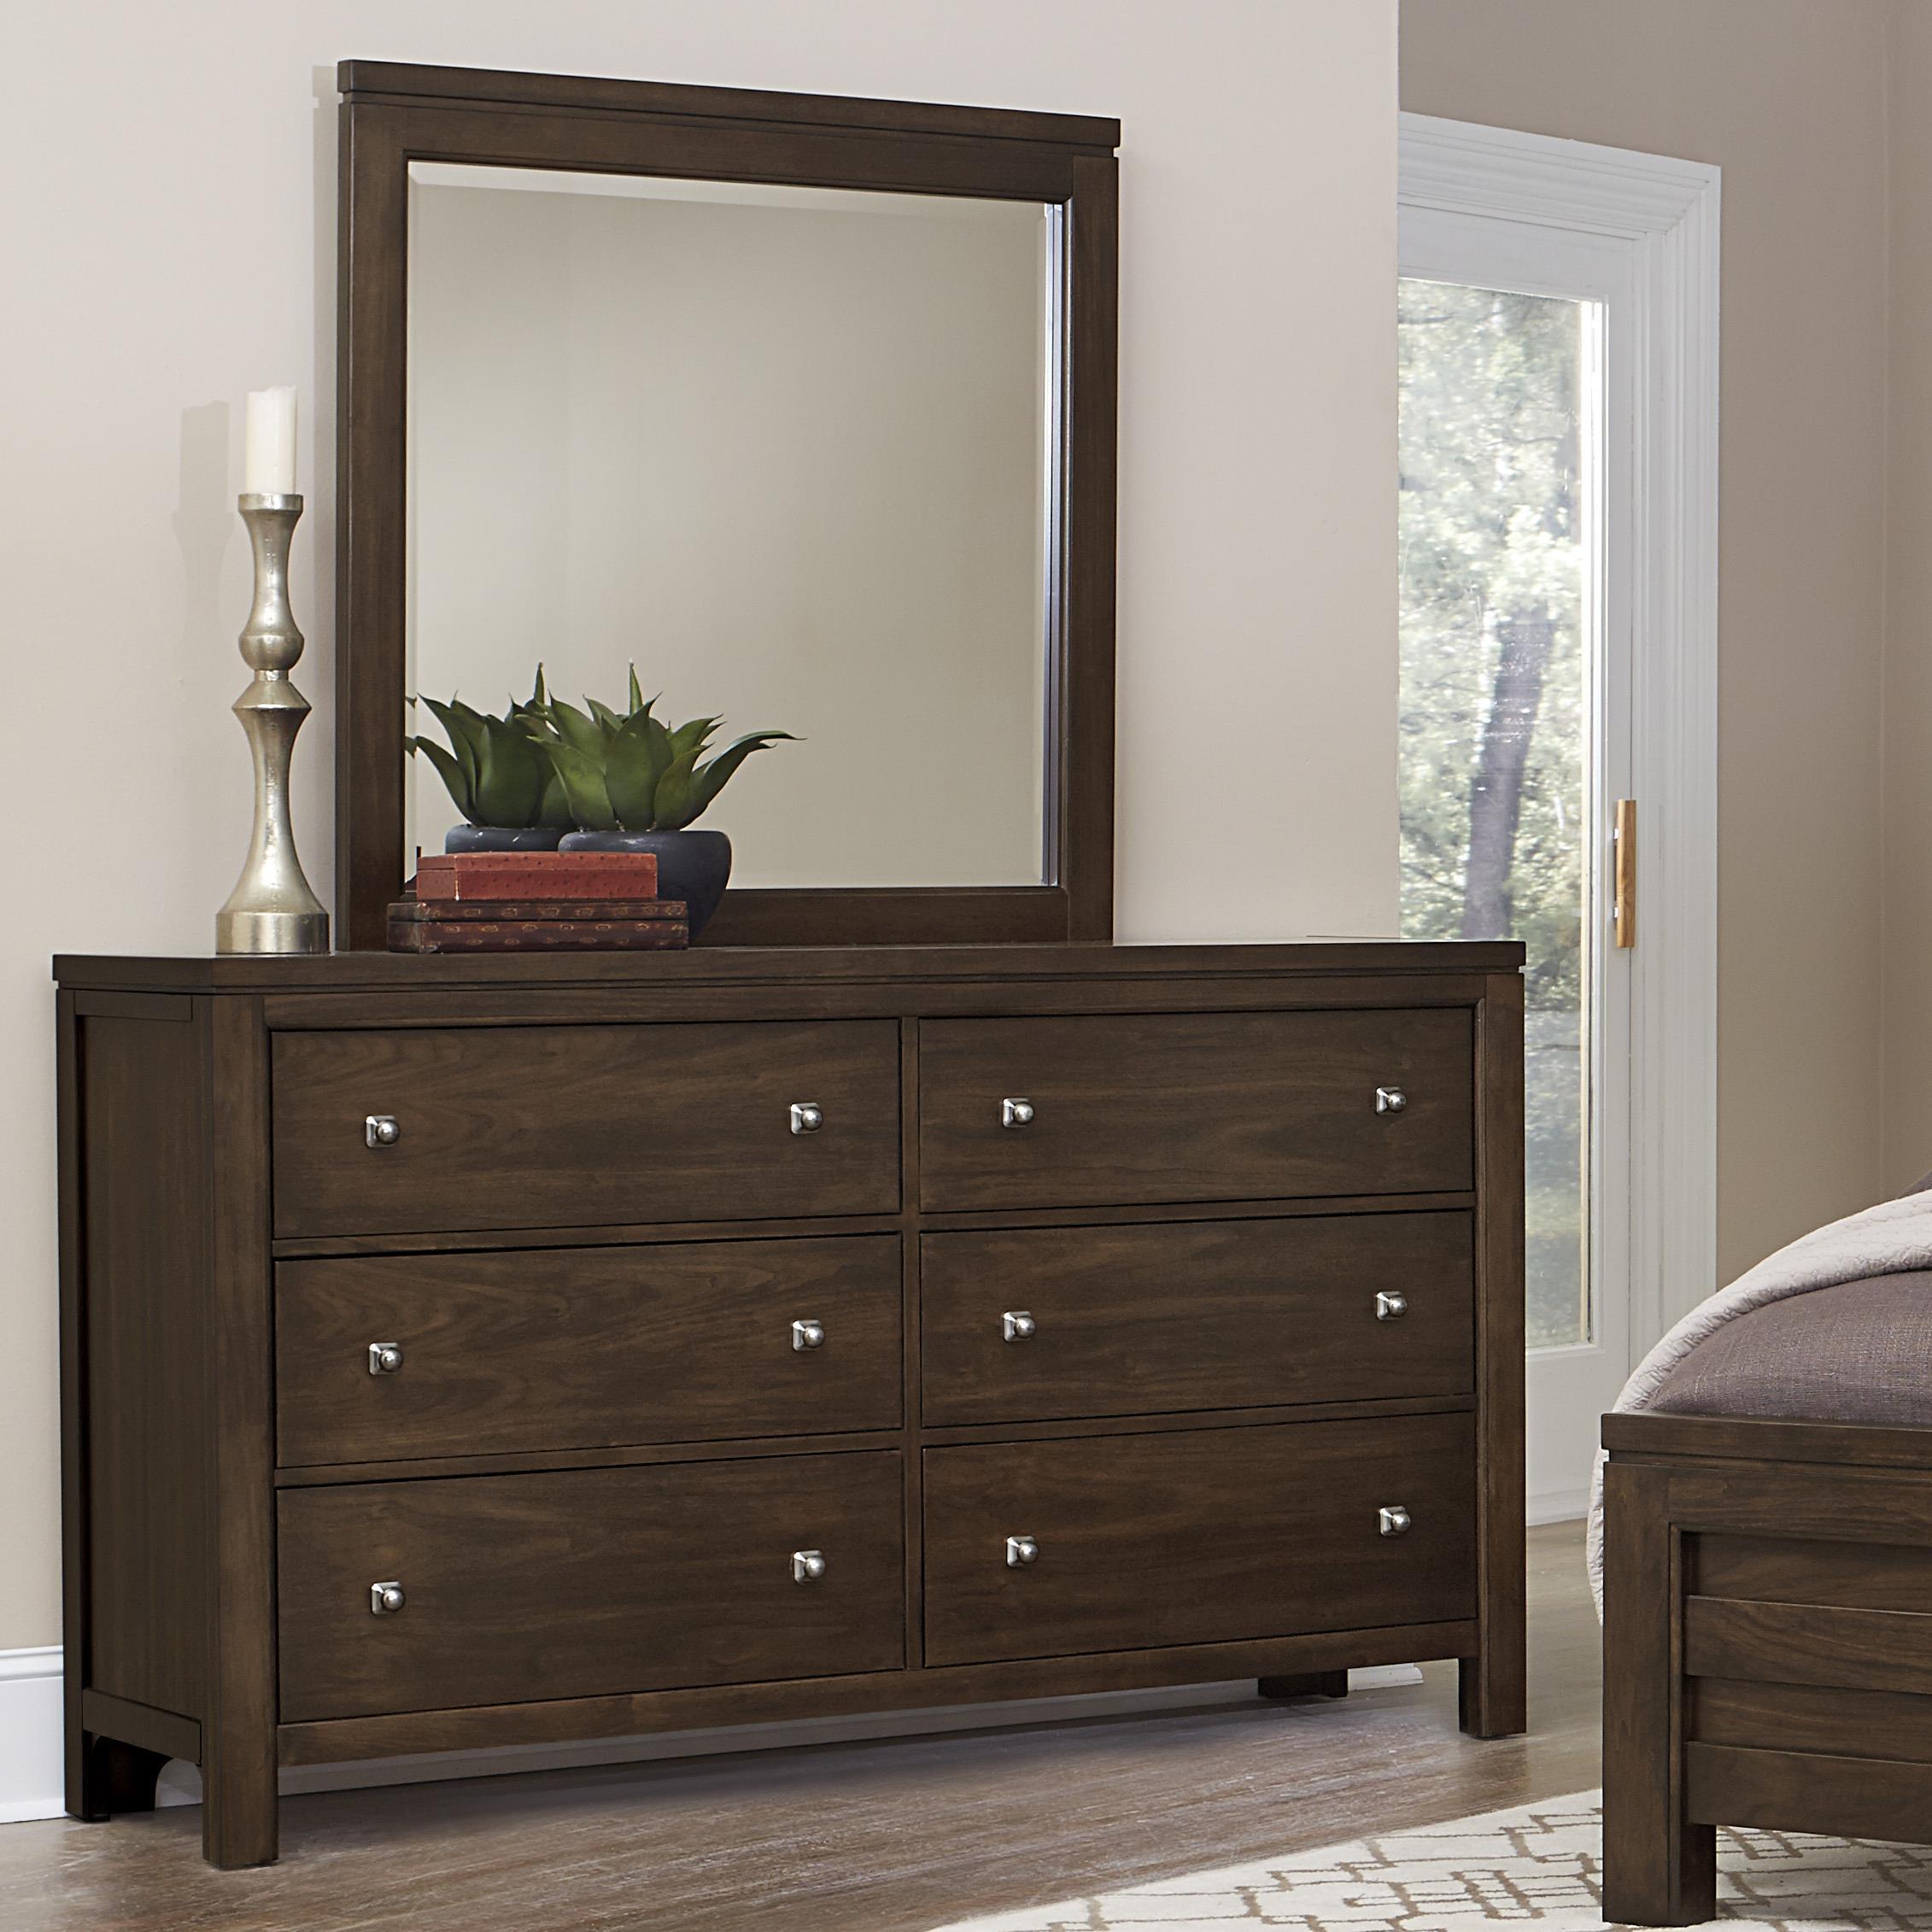 Vaughan Bassett Kismet Dresser & Mirror - Item Number: 410-002+446